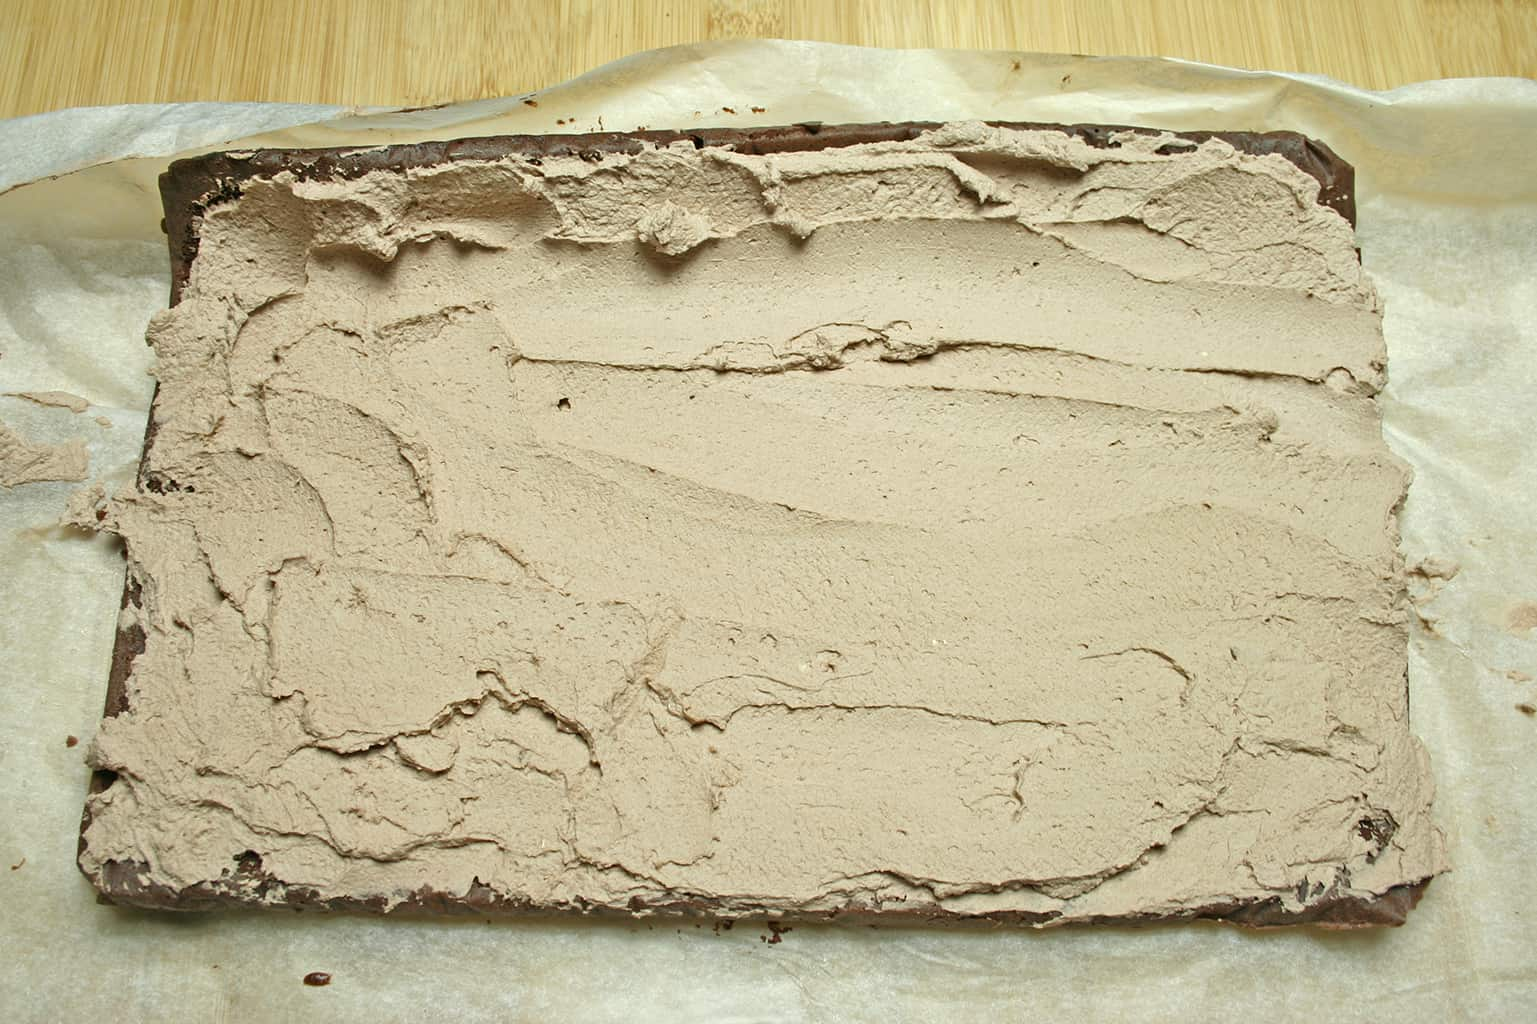 cake with cream on